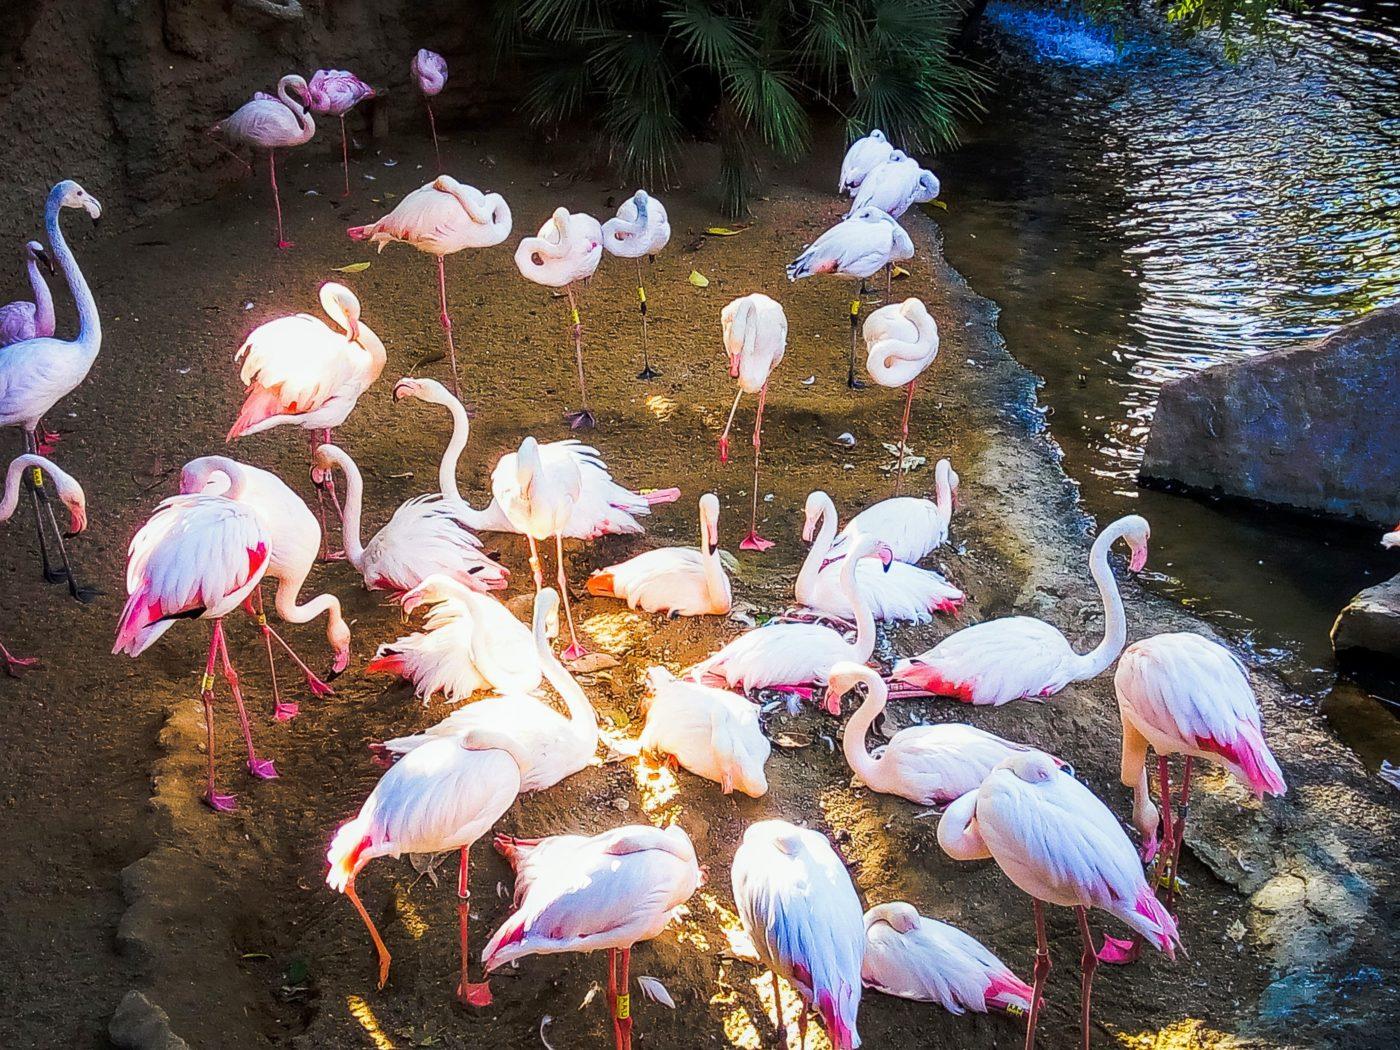 Flamingos in Bioparc Fuengirola on the Costa del Sol